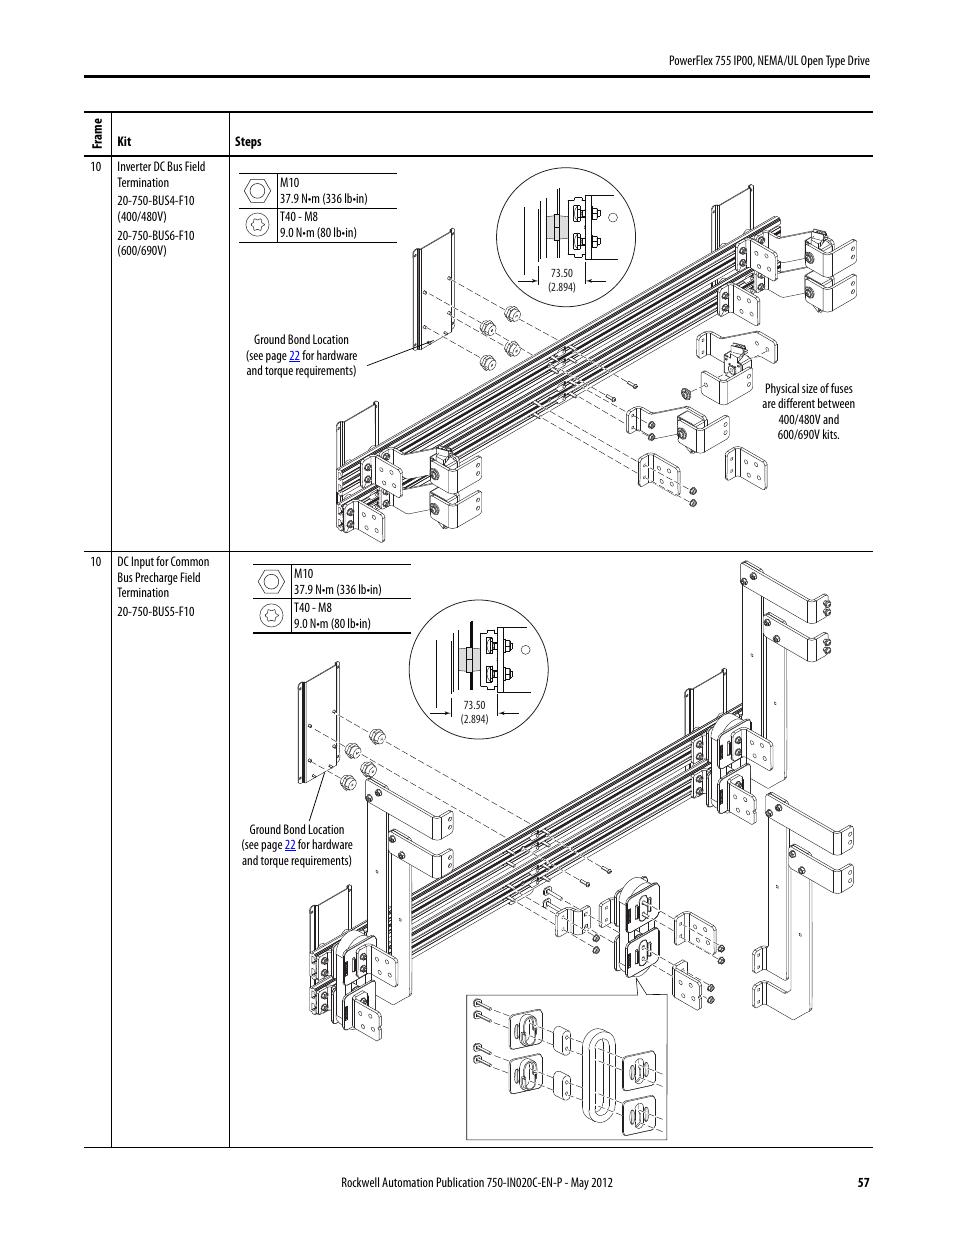 Rockwell Automation 20G PowerFlex 755 IP00 NEMA/UL Open